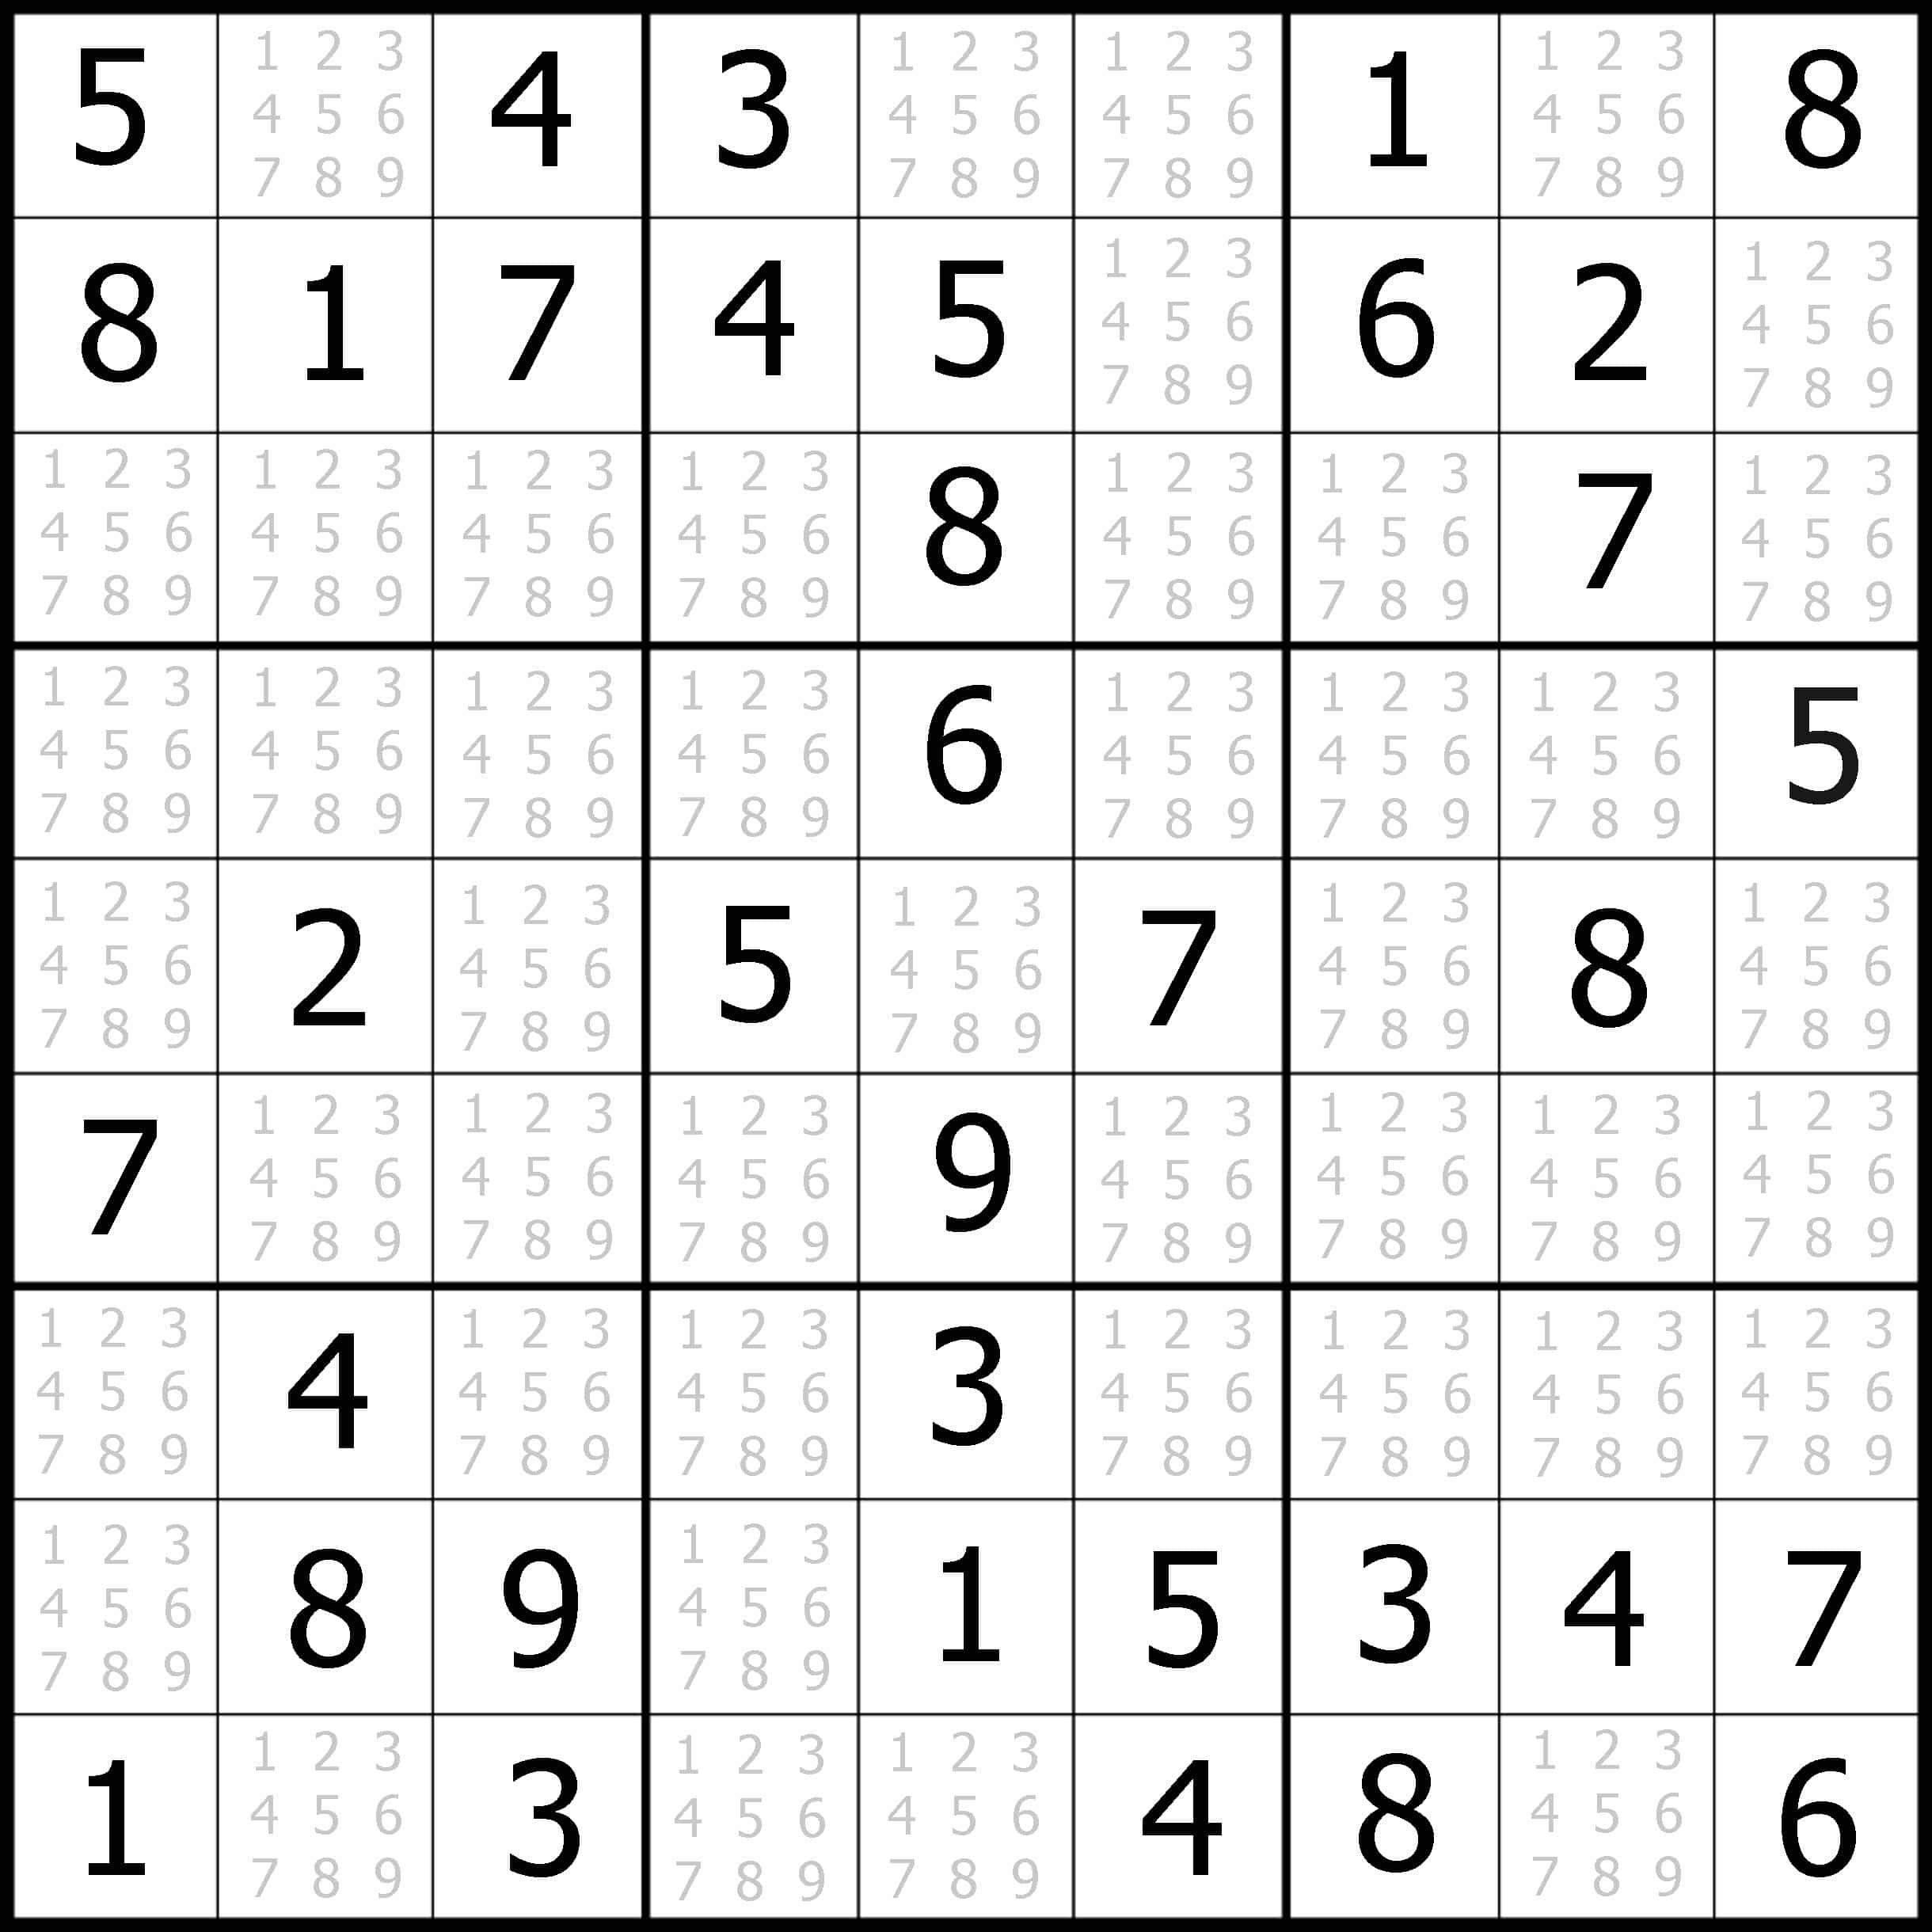 Free Sudoku Images Online